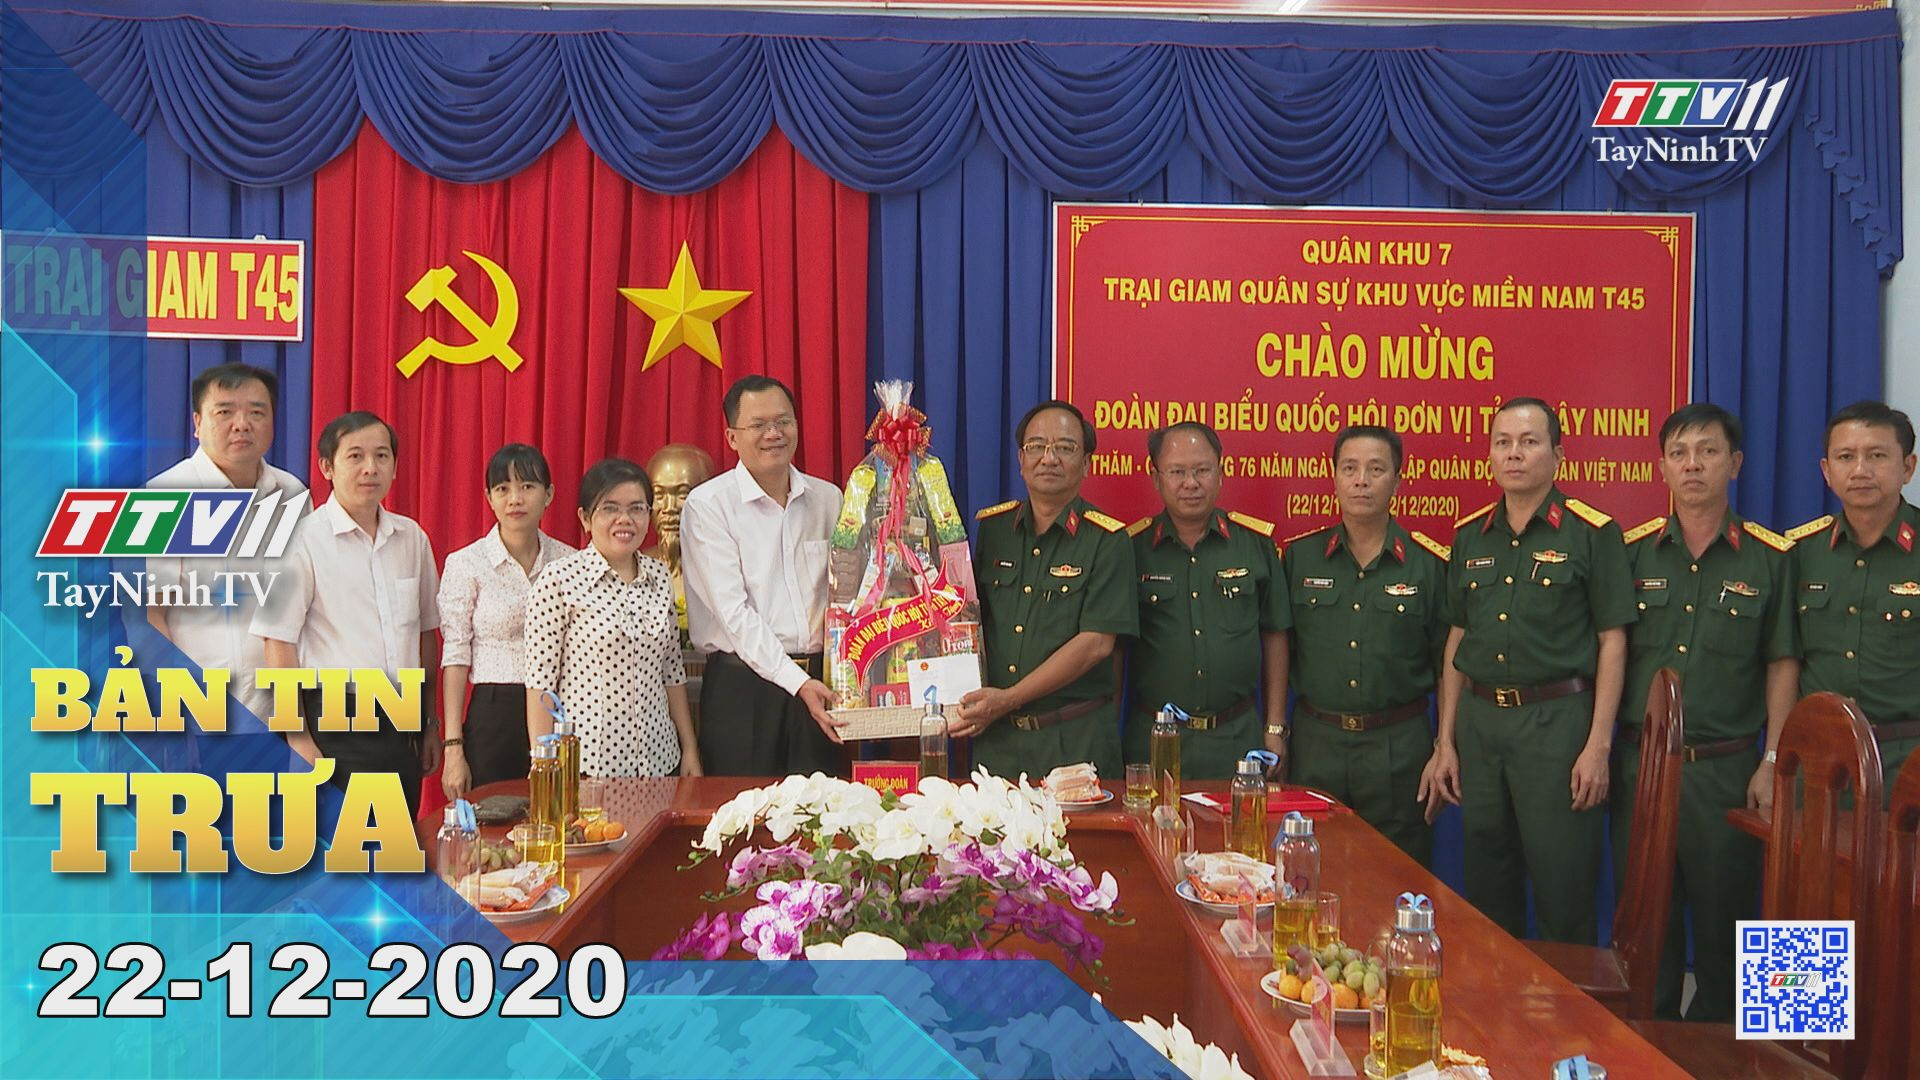 Bản tin trưa 22-12-2020 | Tin tức hôm nay | TayNinhTV